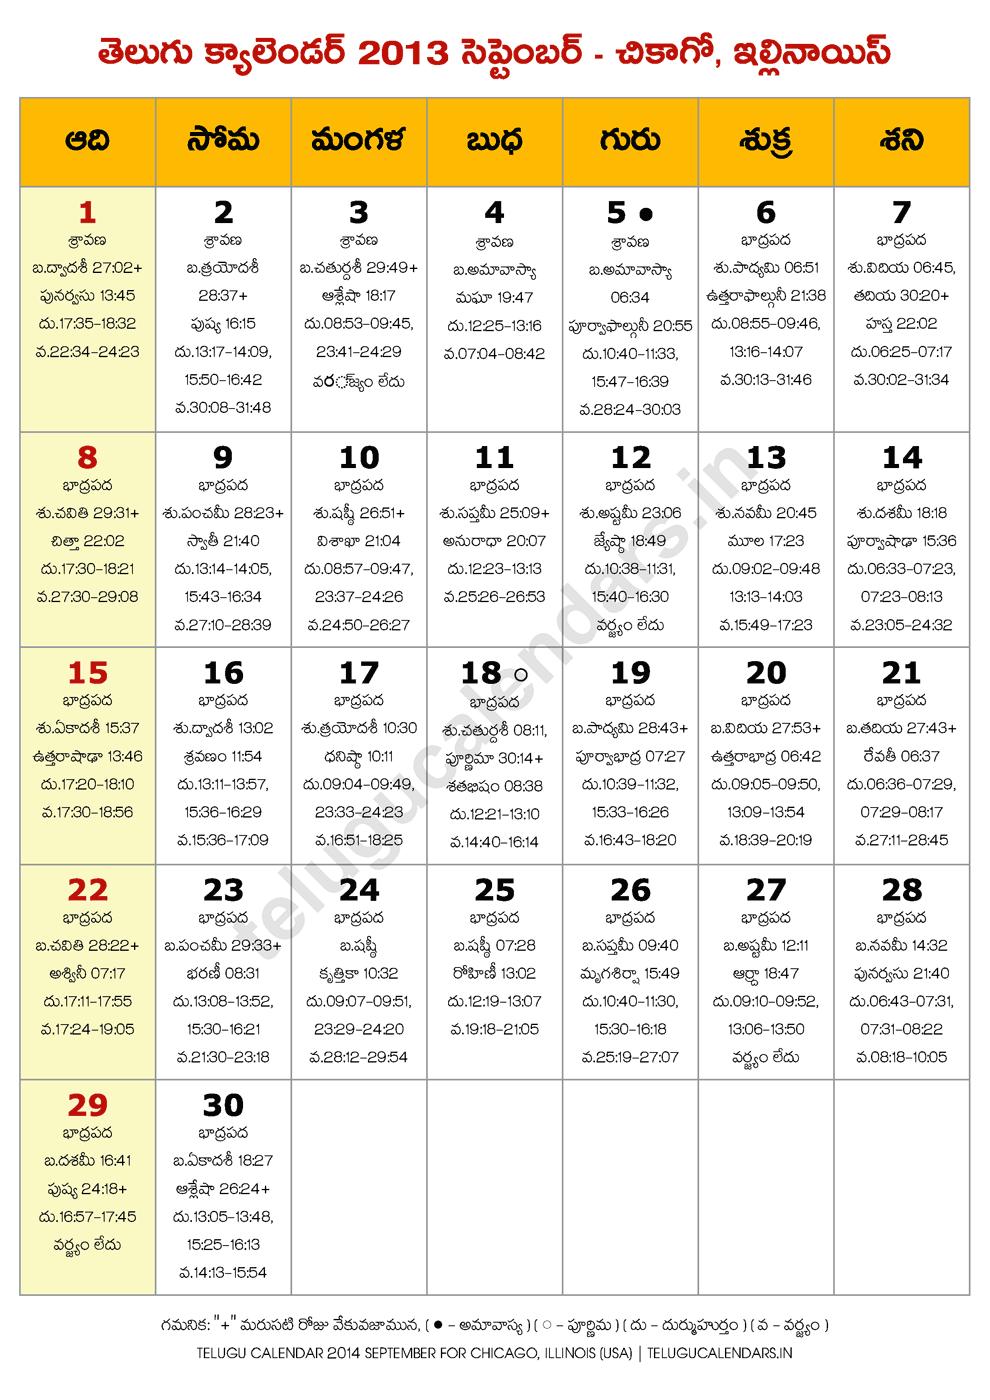 ... Calendar PDF in Telugu, Chicago (Illinois, USA) Telugu Calendar 2013